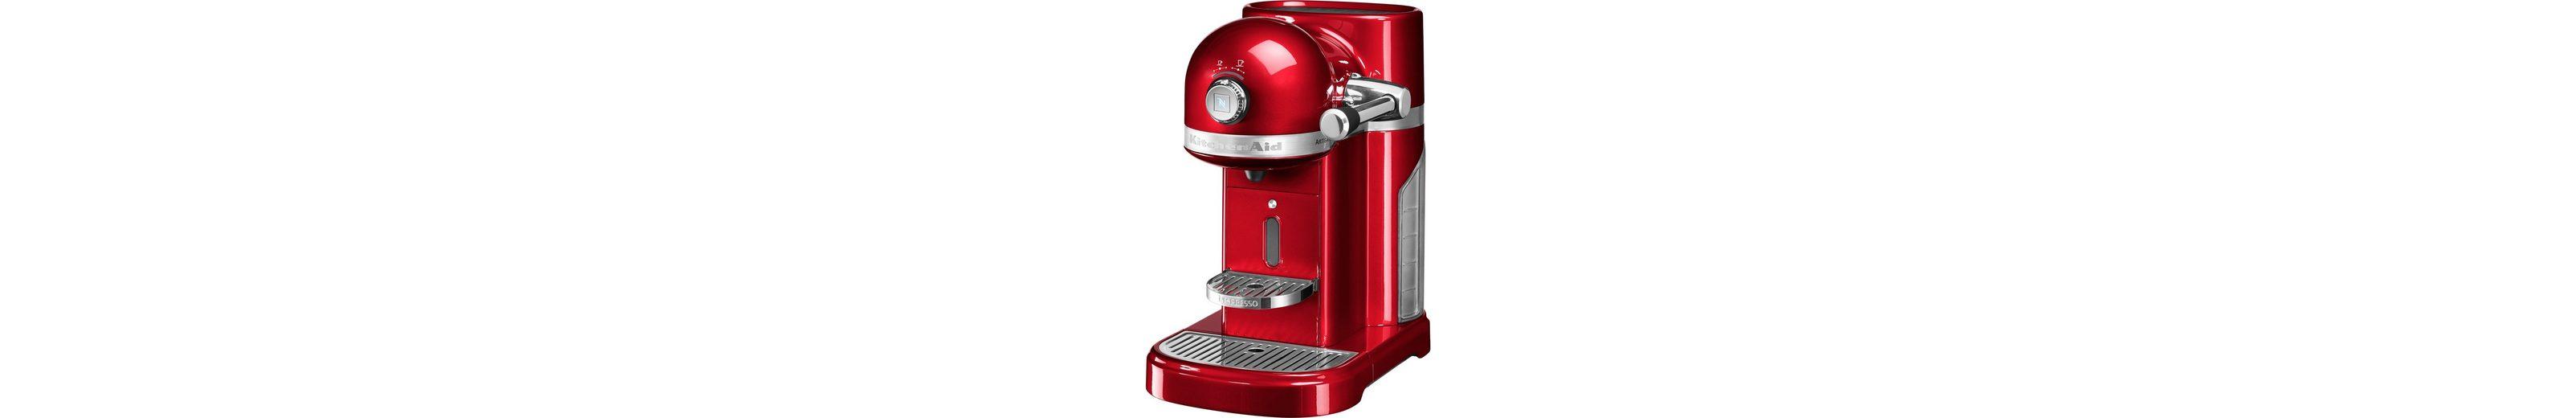 Kitchenaid Nespresso 5KES0503ECA, liebesapfelrot